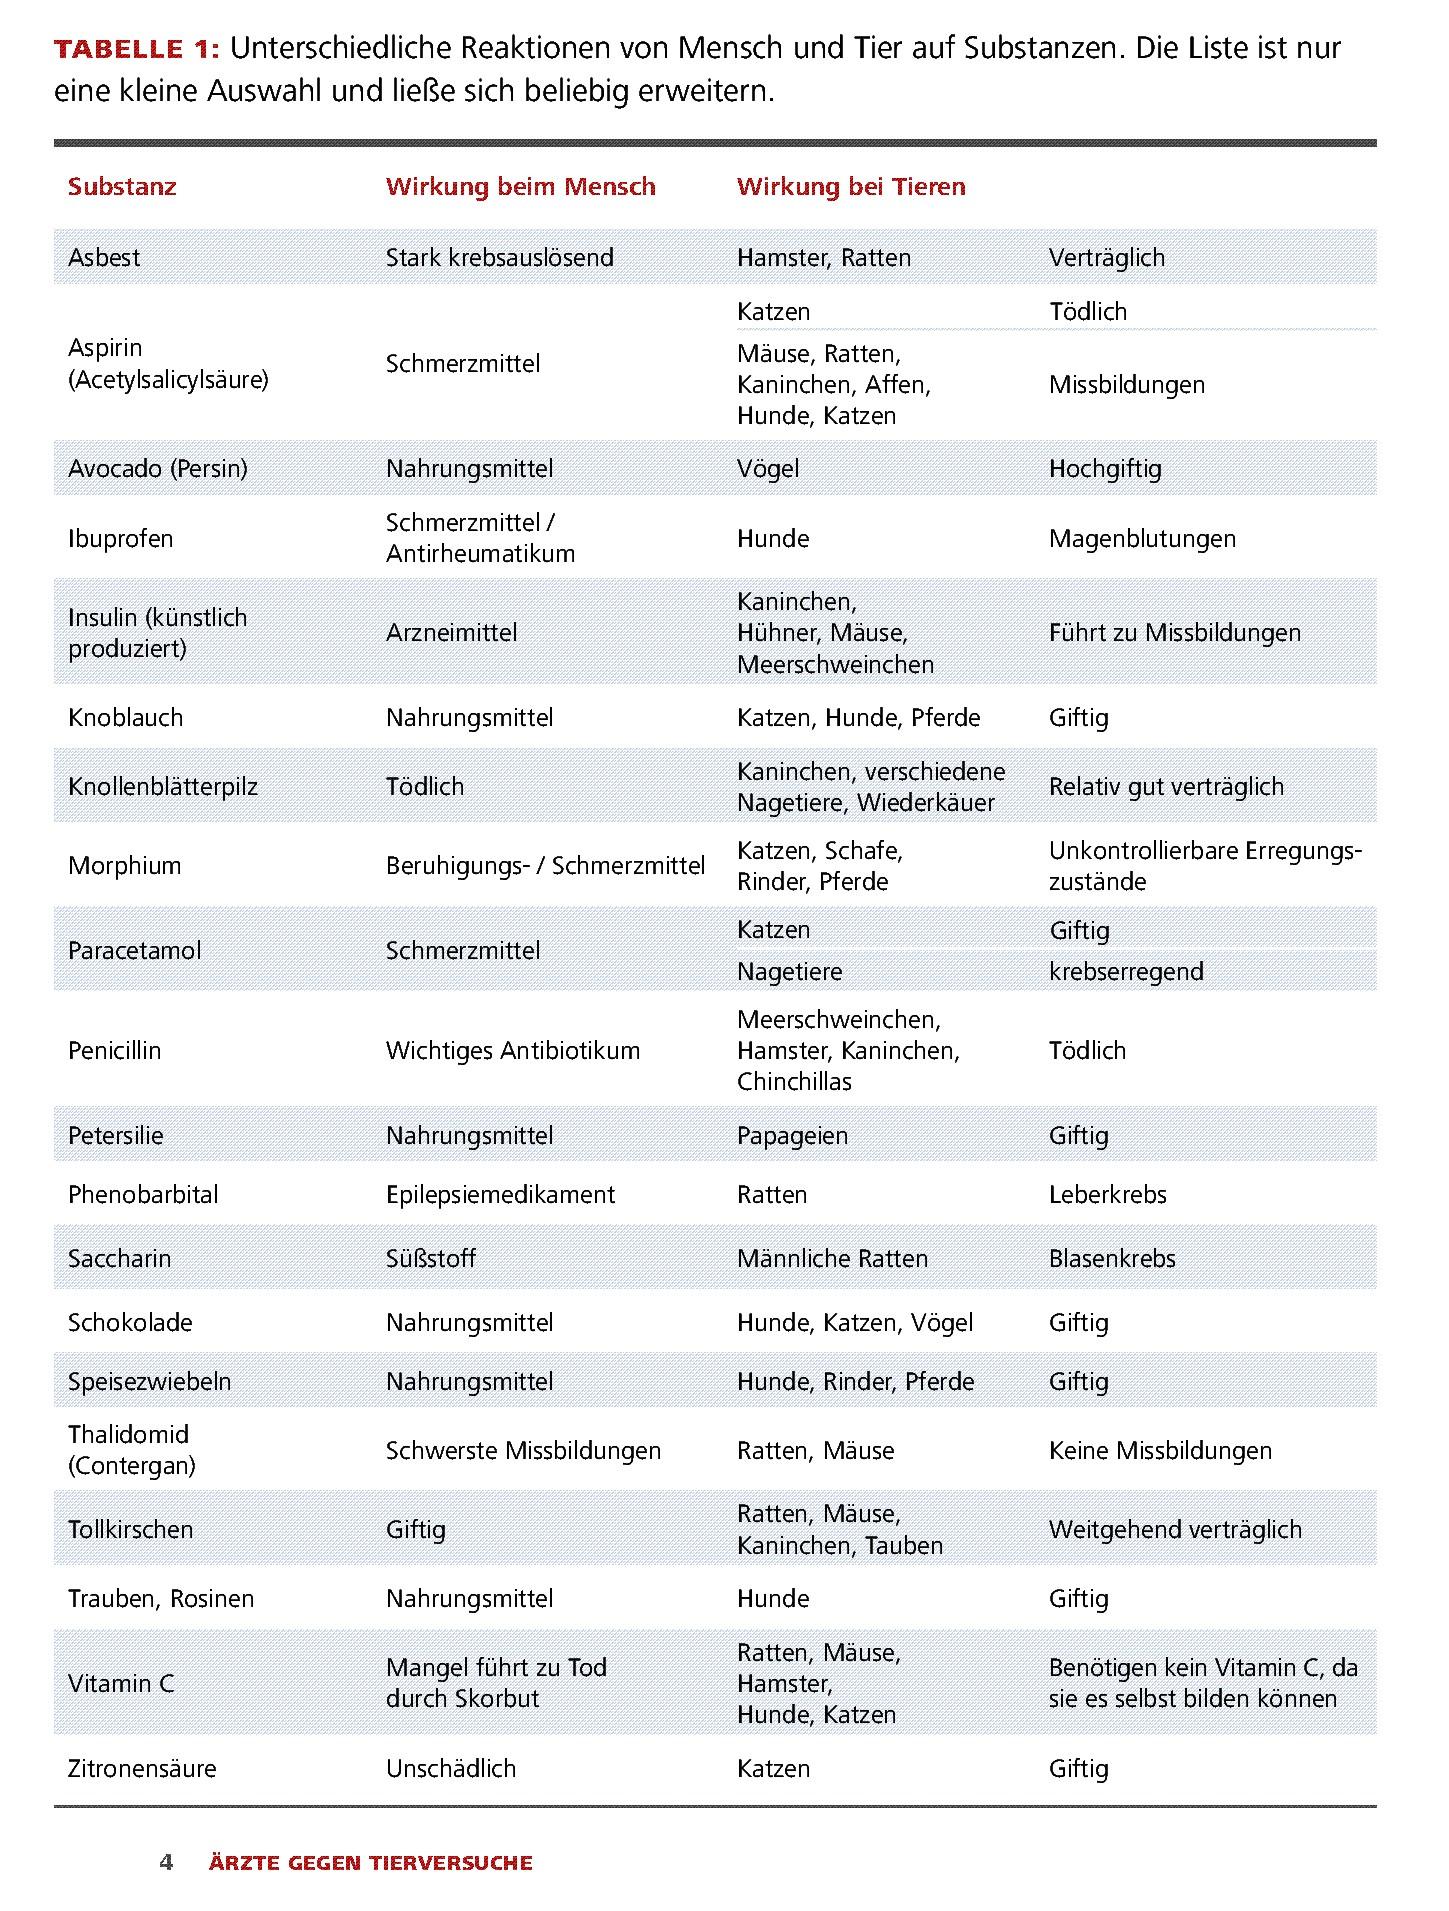 tabelle-arzneimittel.jpg